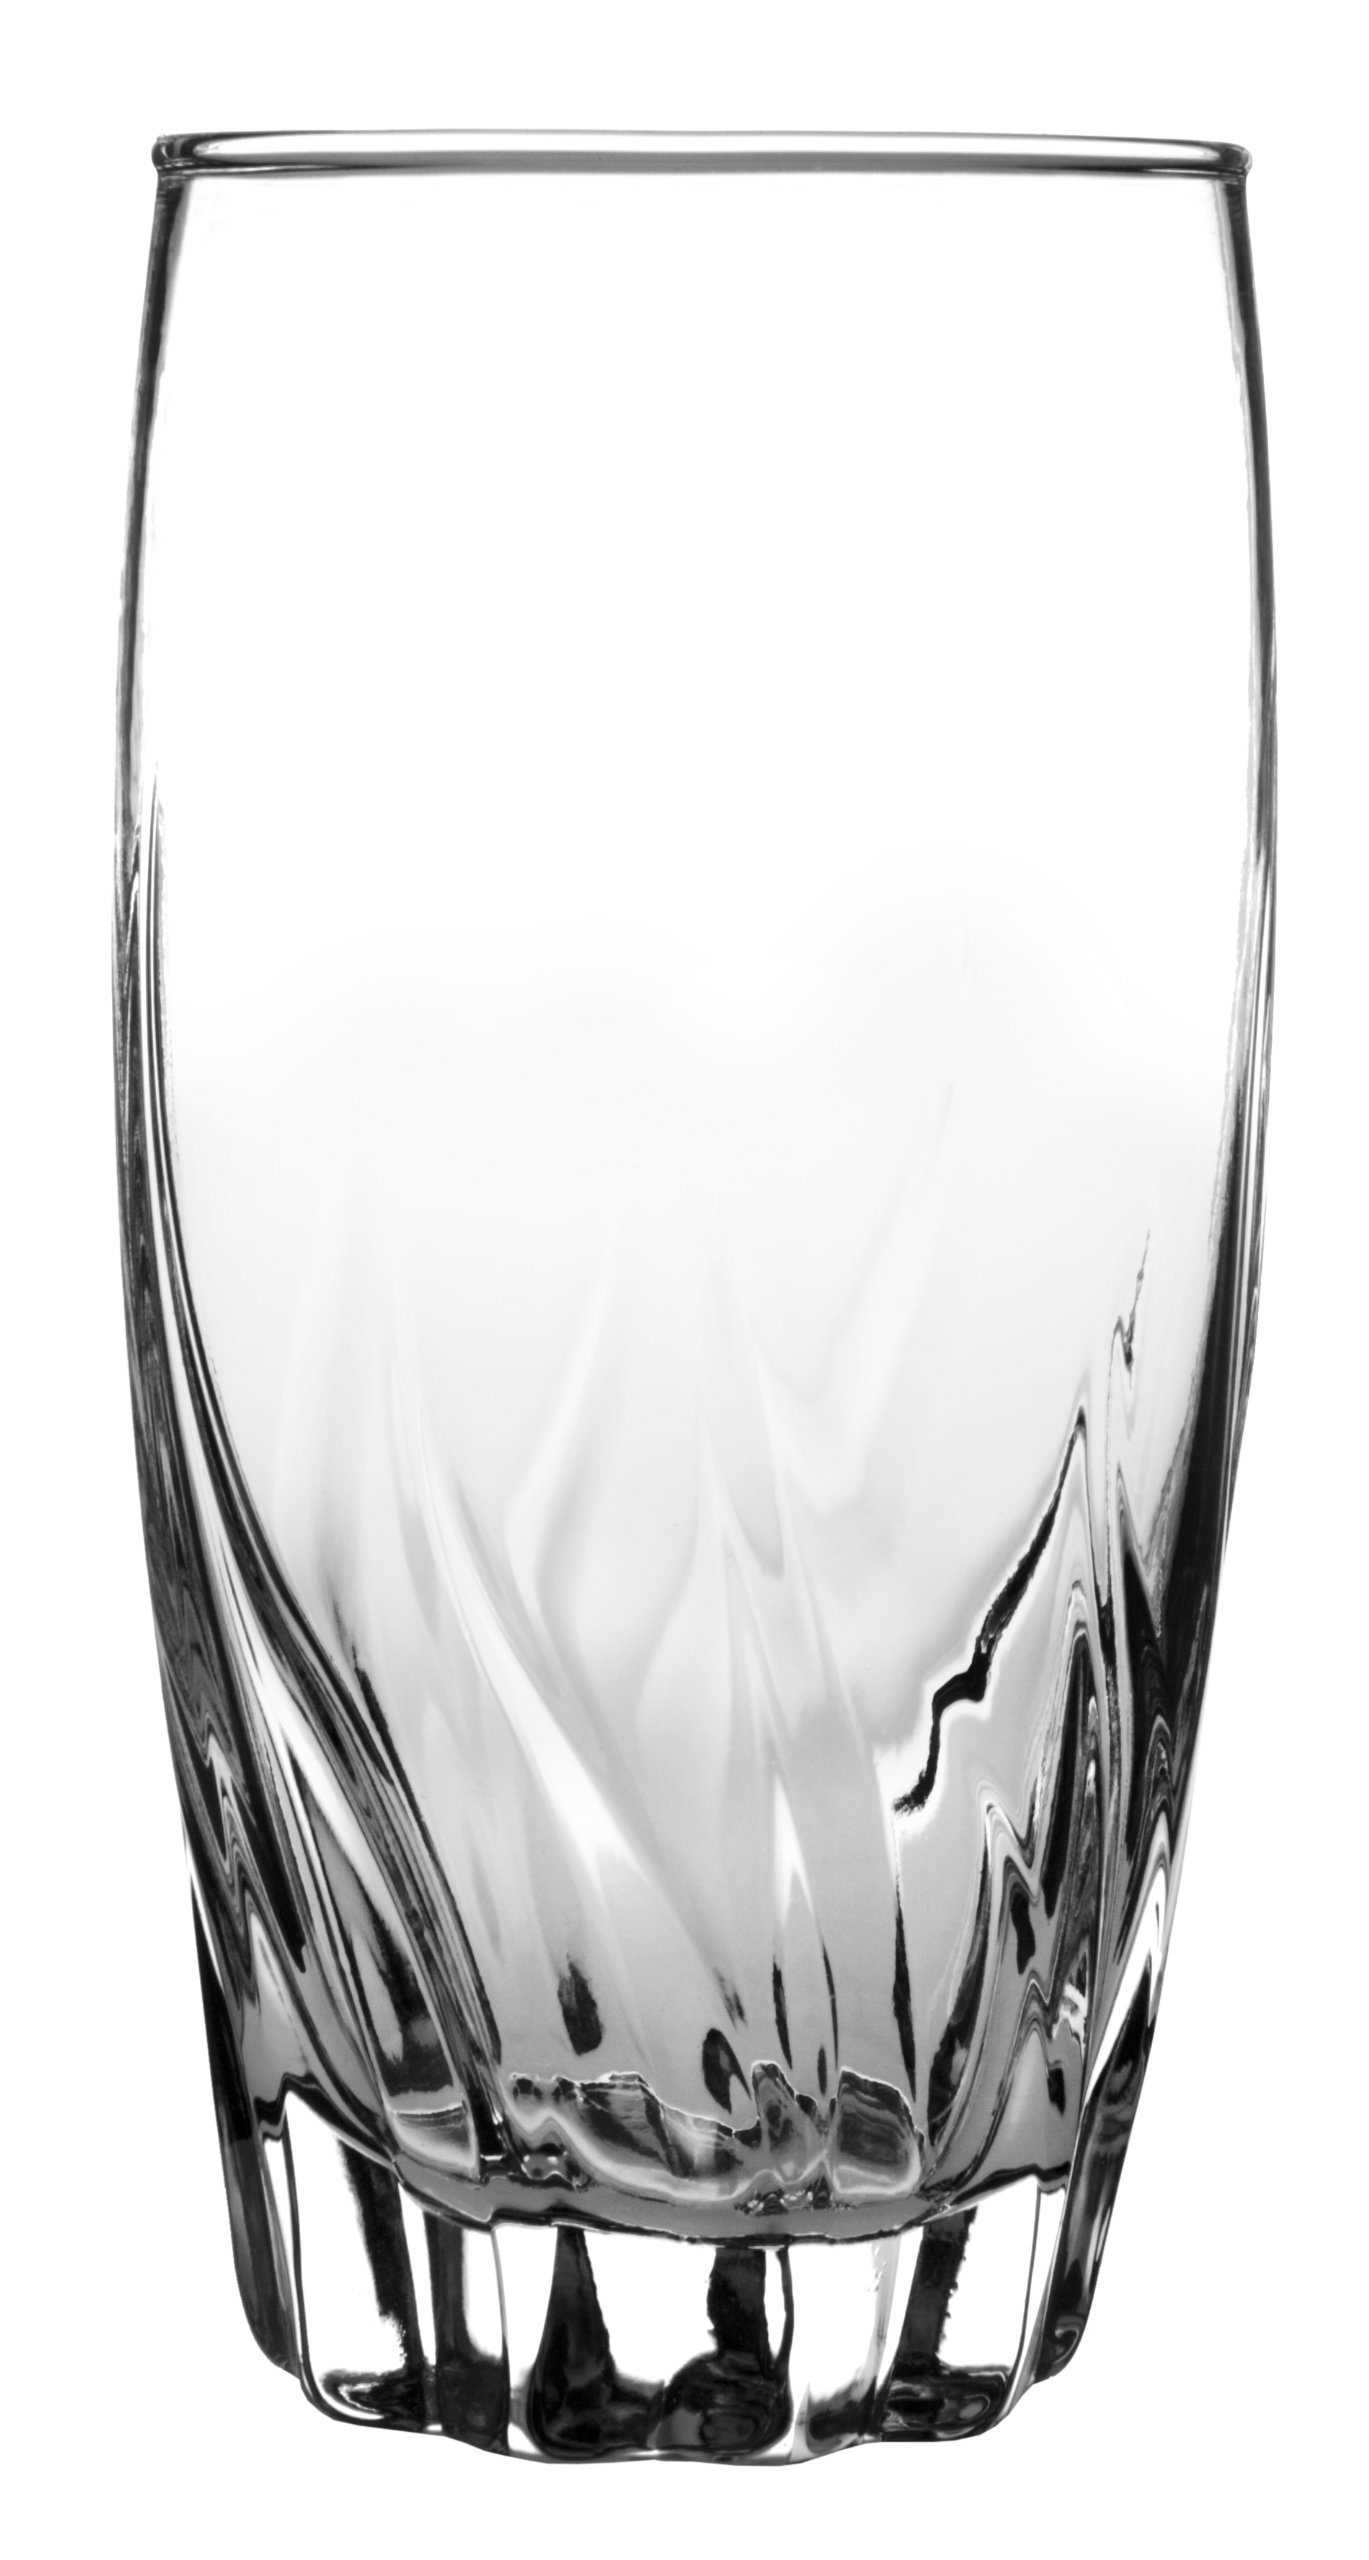 Anchor Hocking Central Park Drinking Glasses, 16 oz (Set of 12)